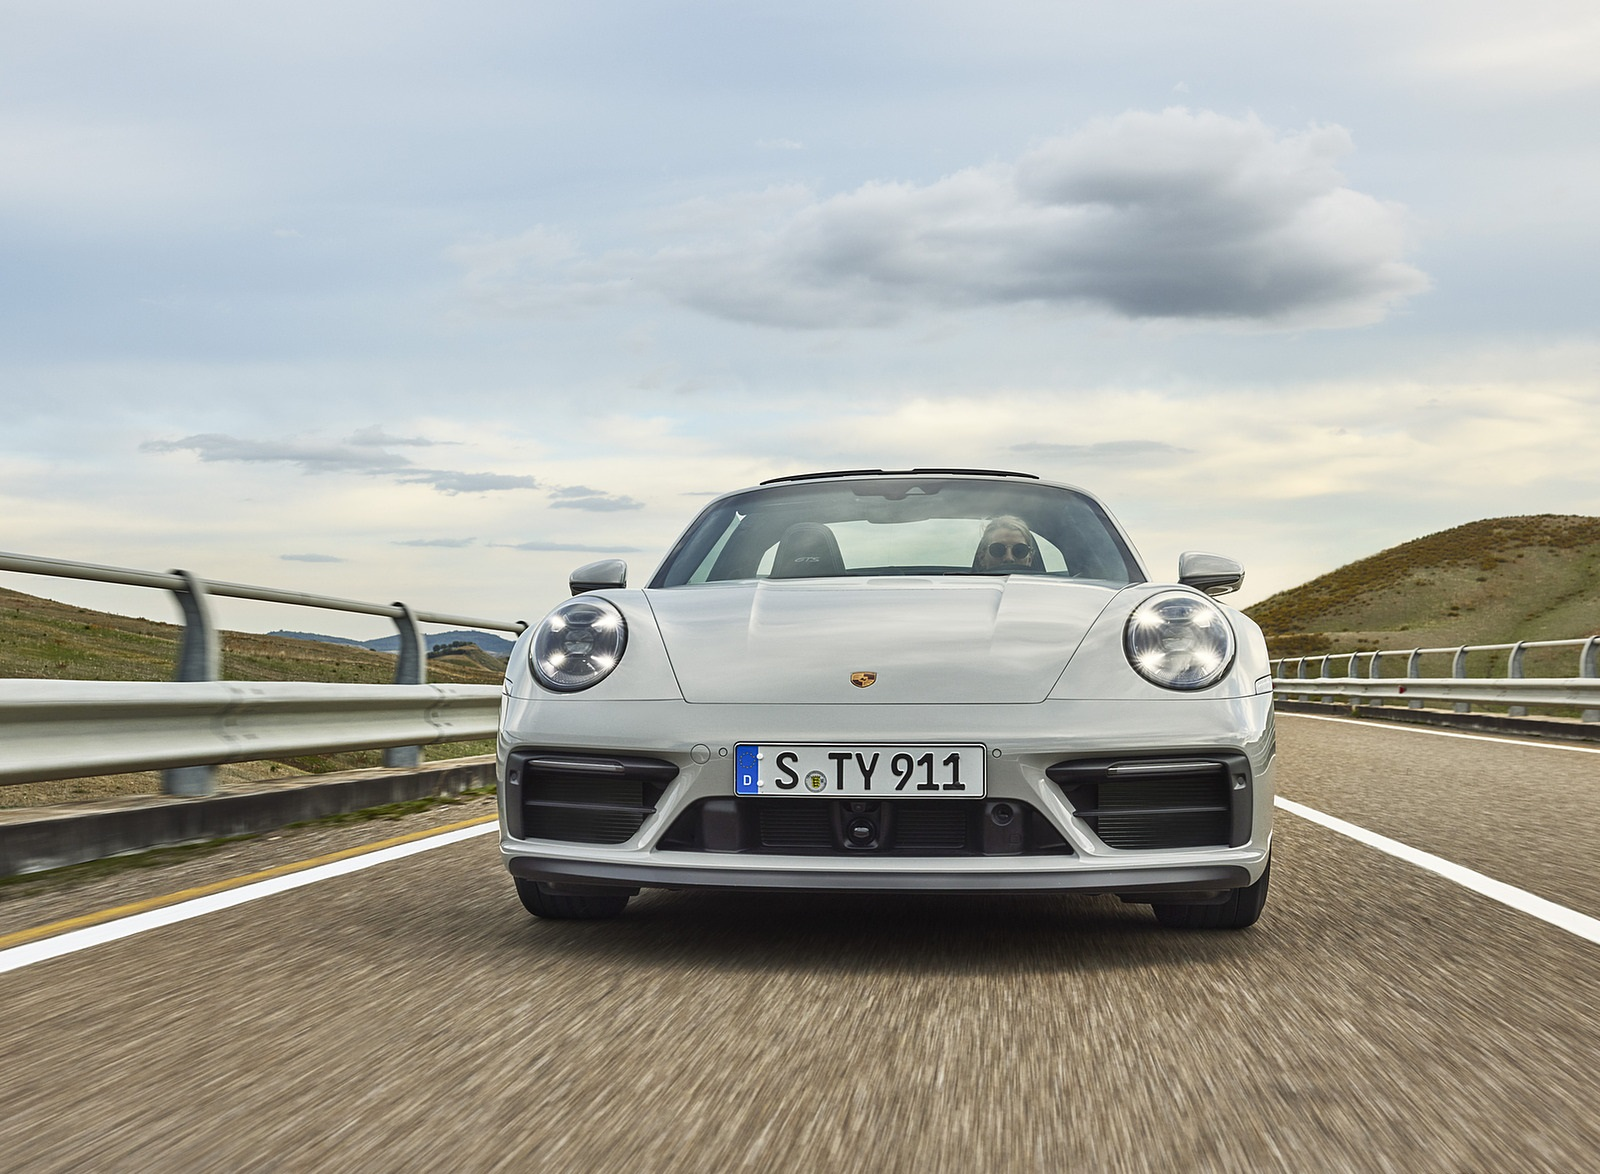 2022 Porsche 911 Targa 4 GTS Front Wallpapers (6)